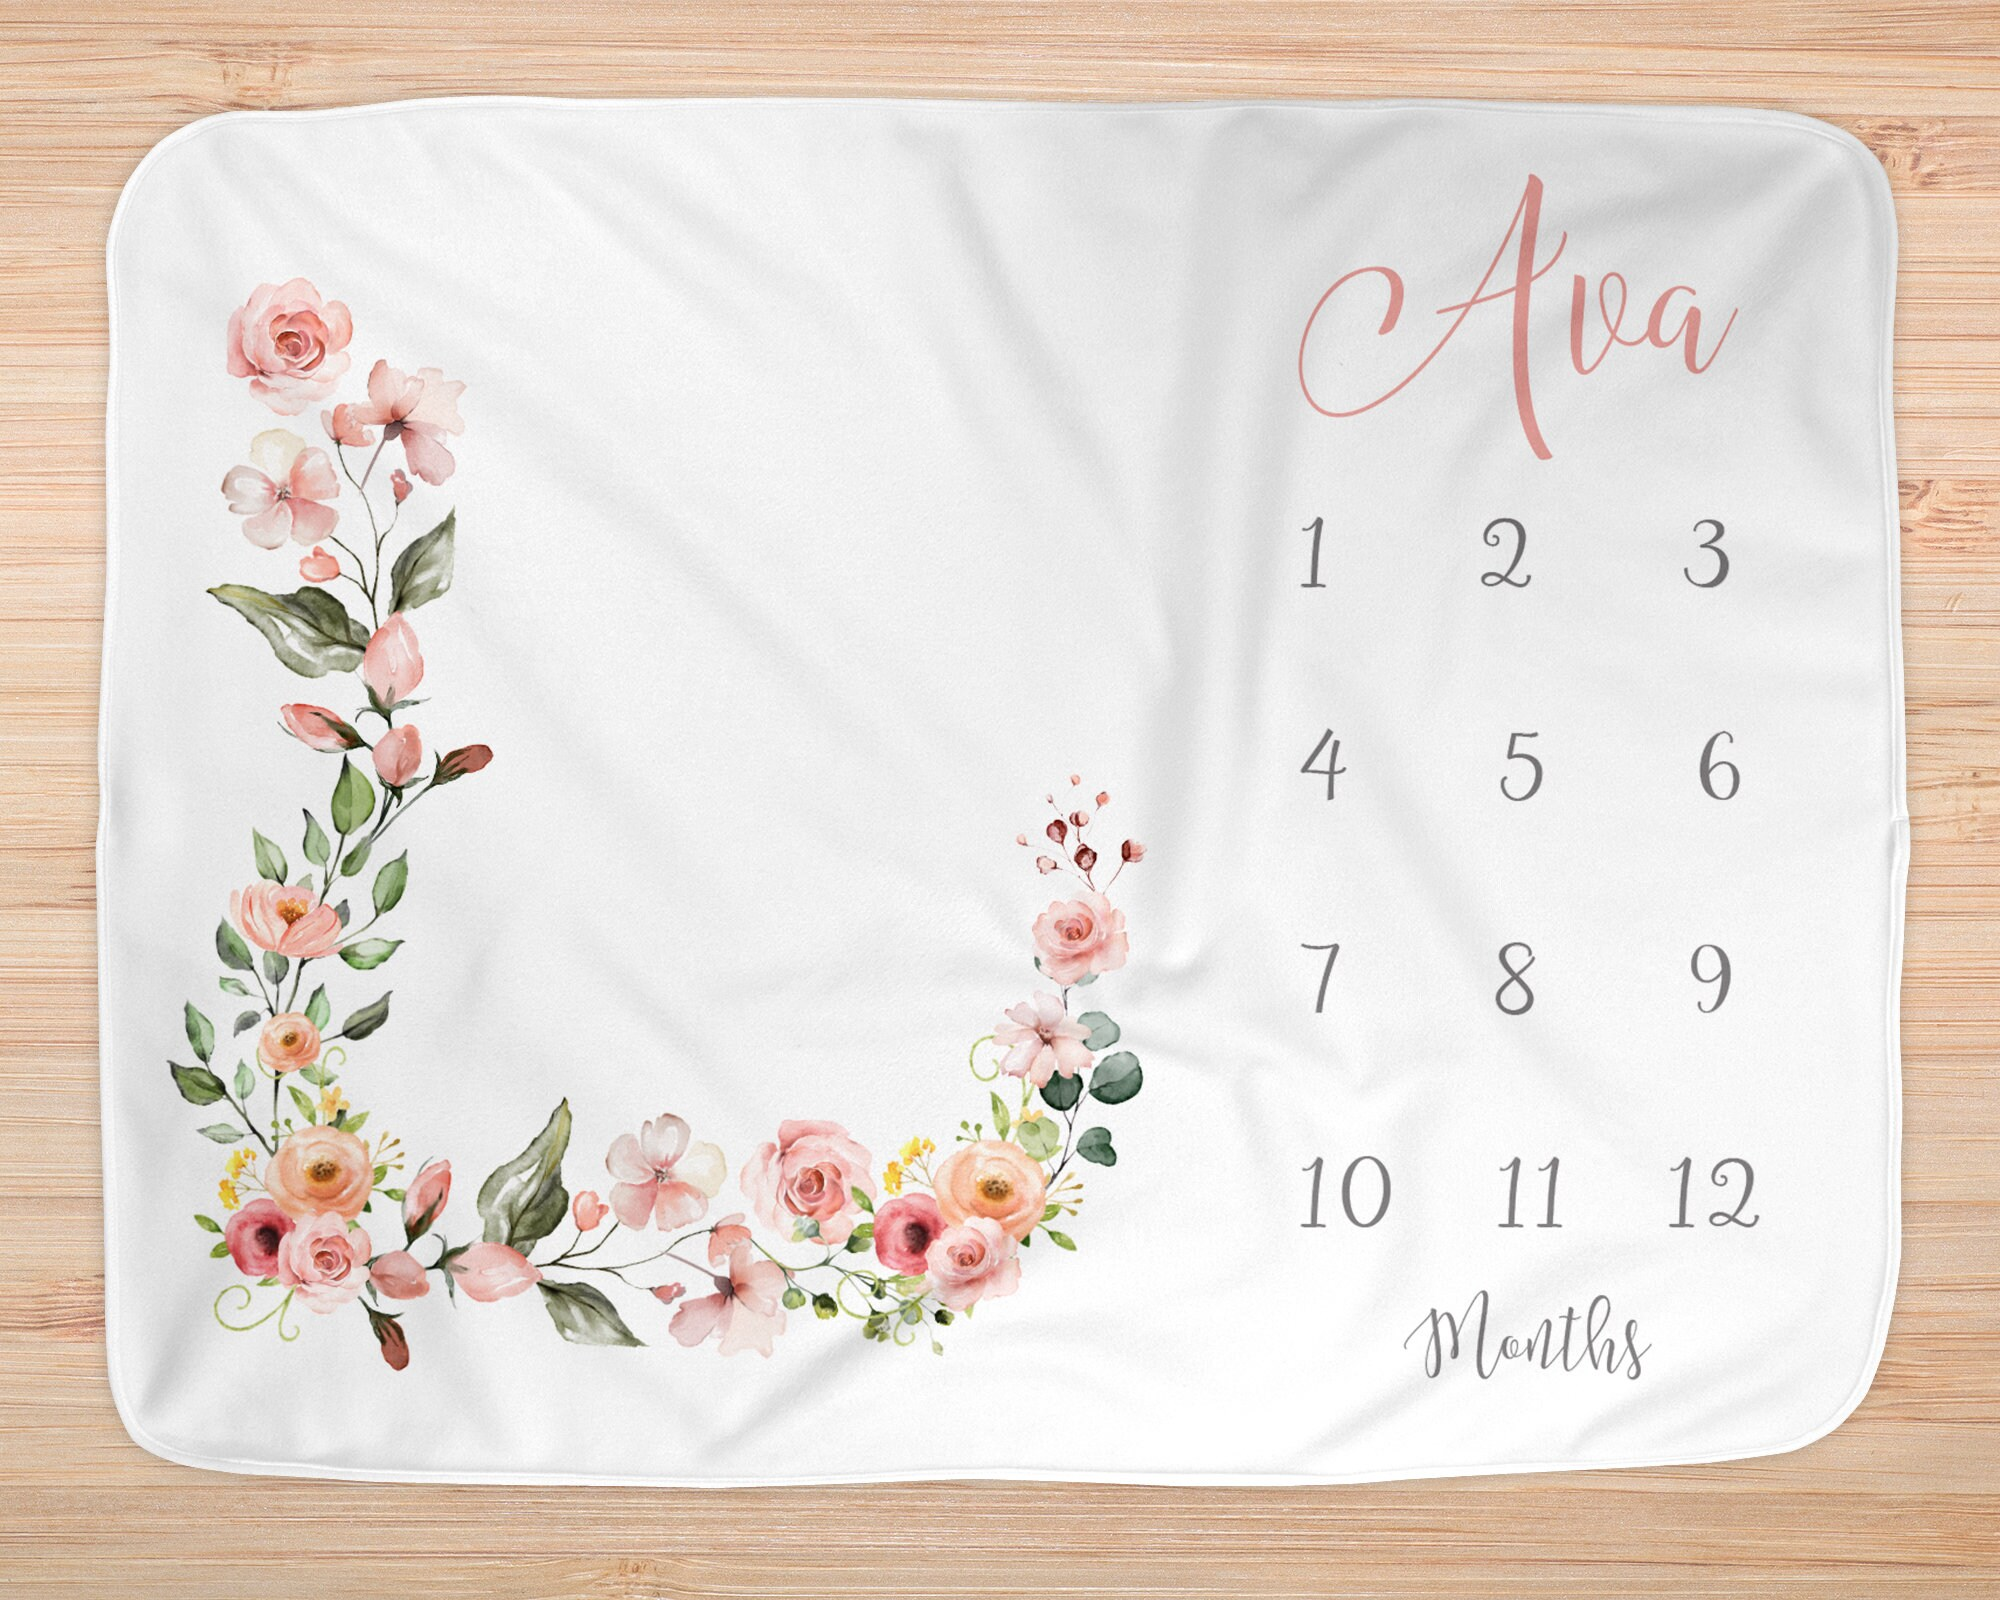 Baby Shower Blanket Milestone Blanket Monthly Growth Tracker Name Blanket Baby Blanket Gift Personalized Blanket New Mom Gift